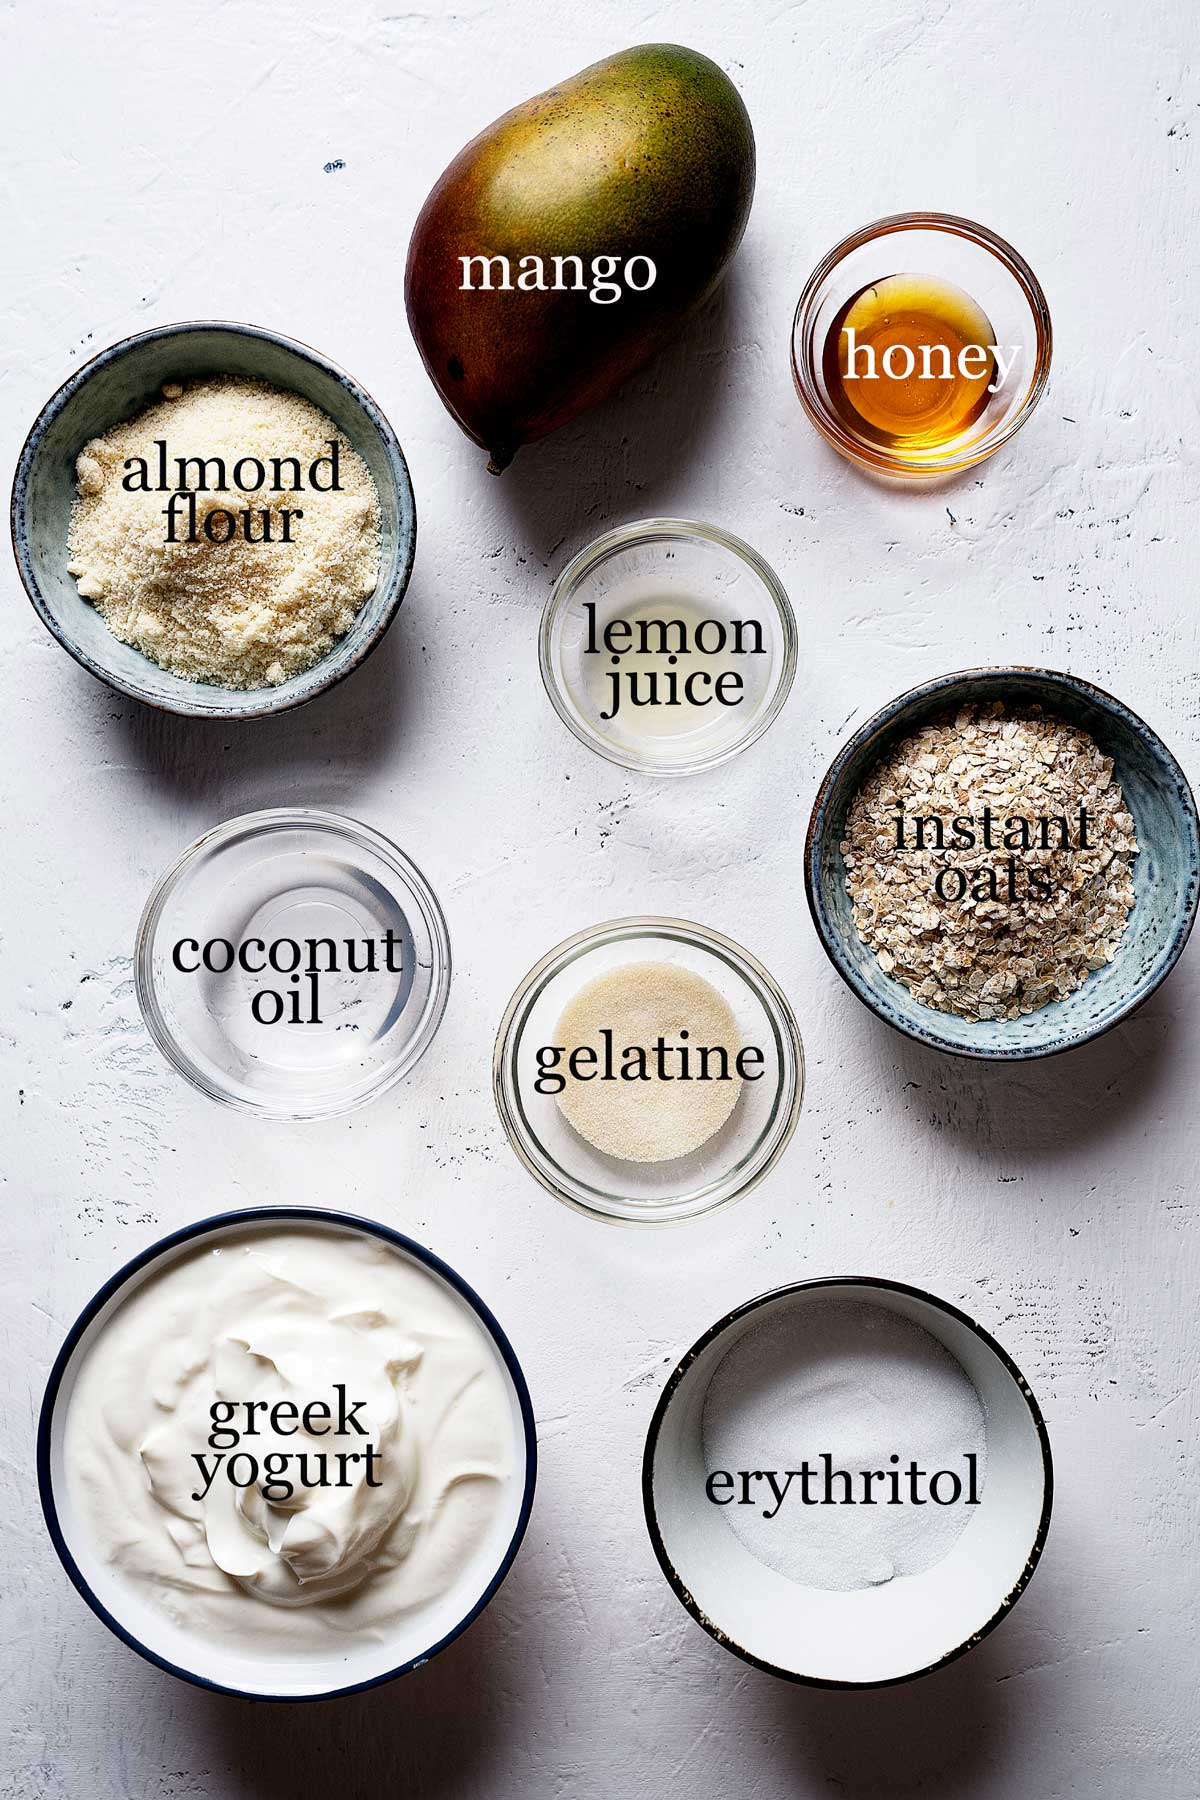 Ingredients to make healthy no bake mango cheesecake